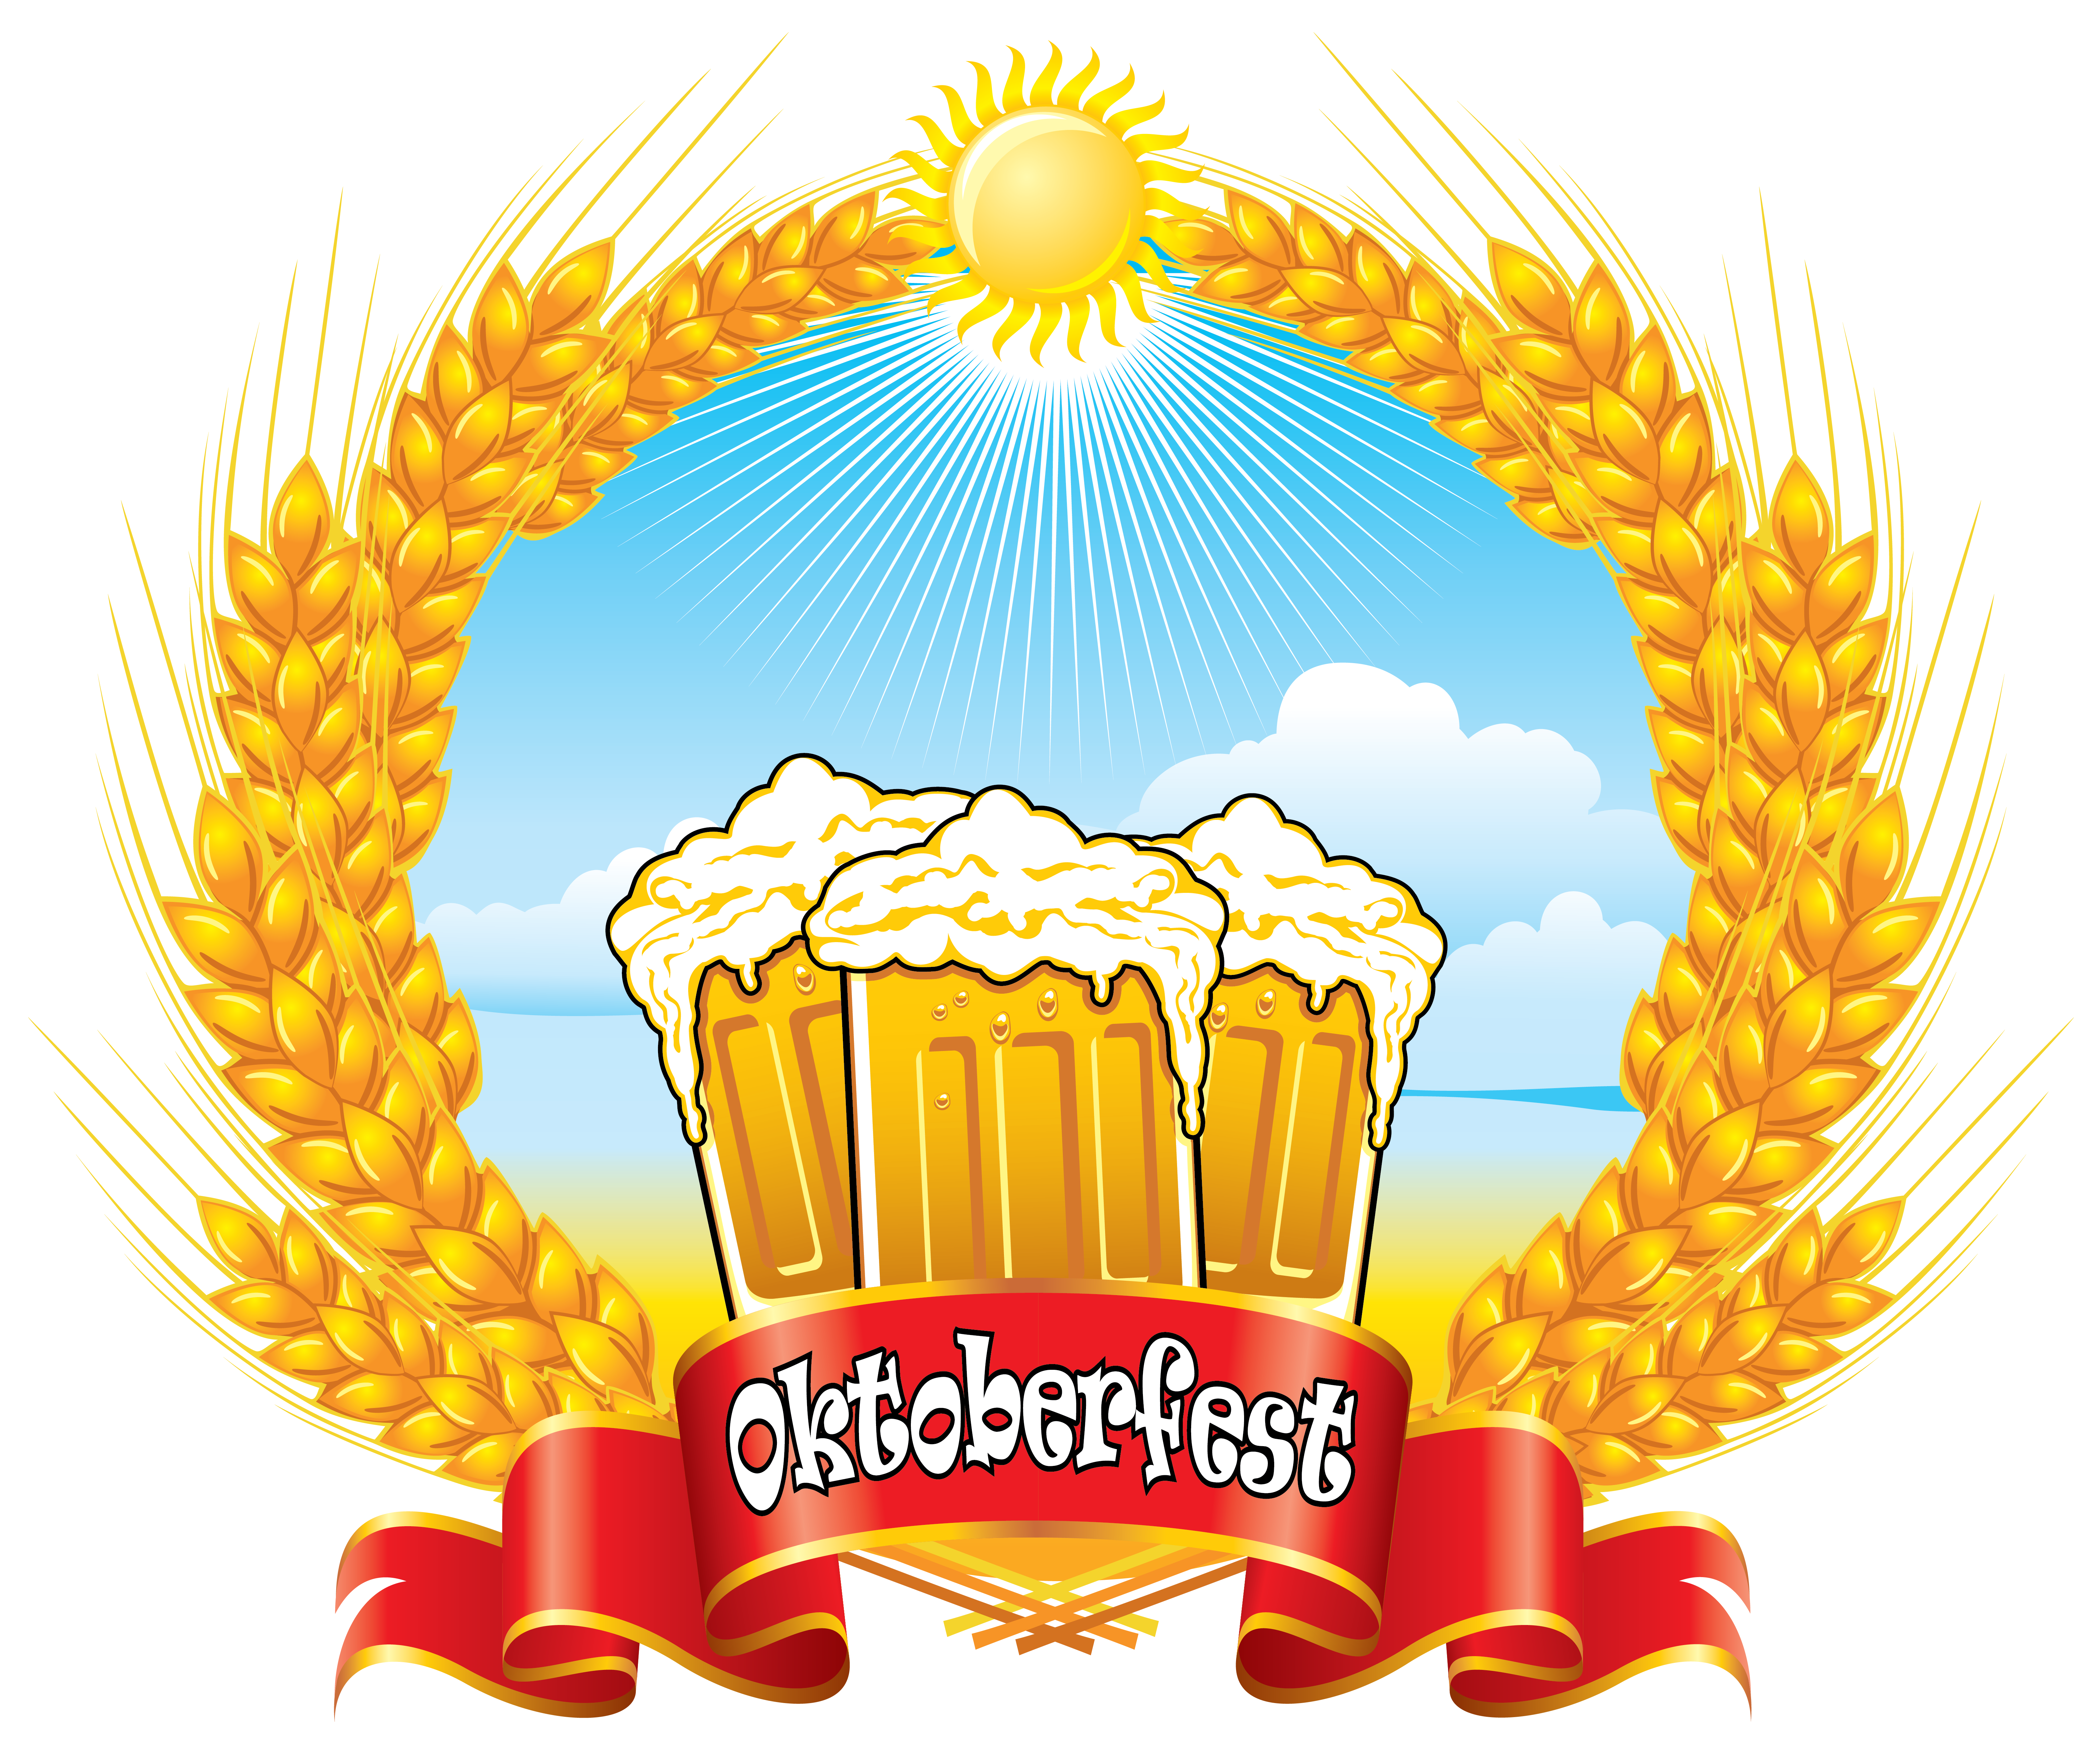 Garden clipart banner. Oktoberfest red with beer